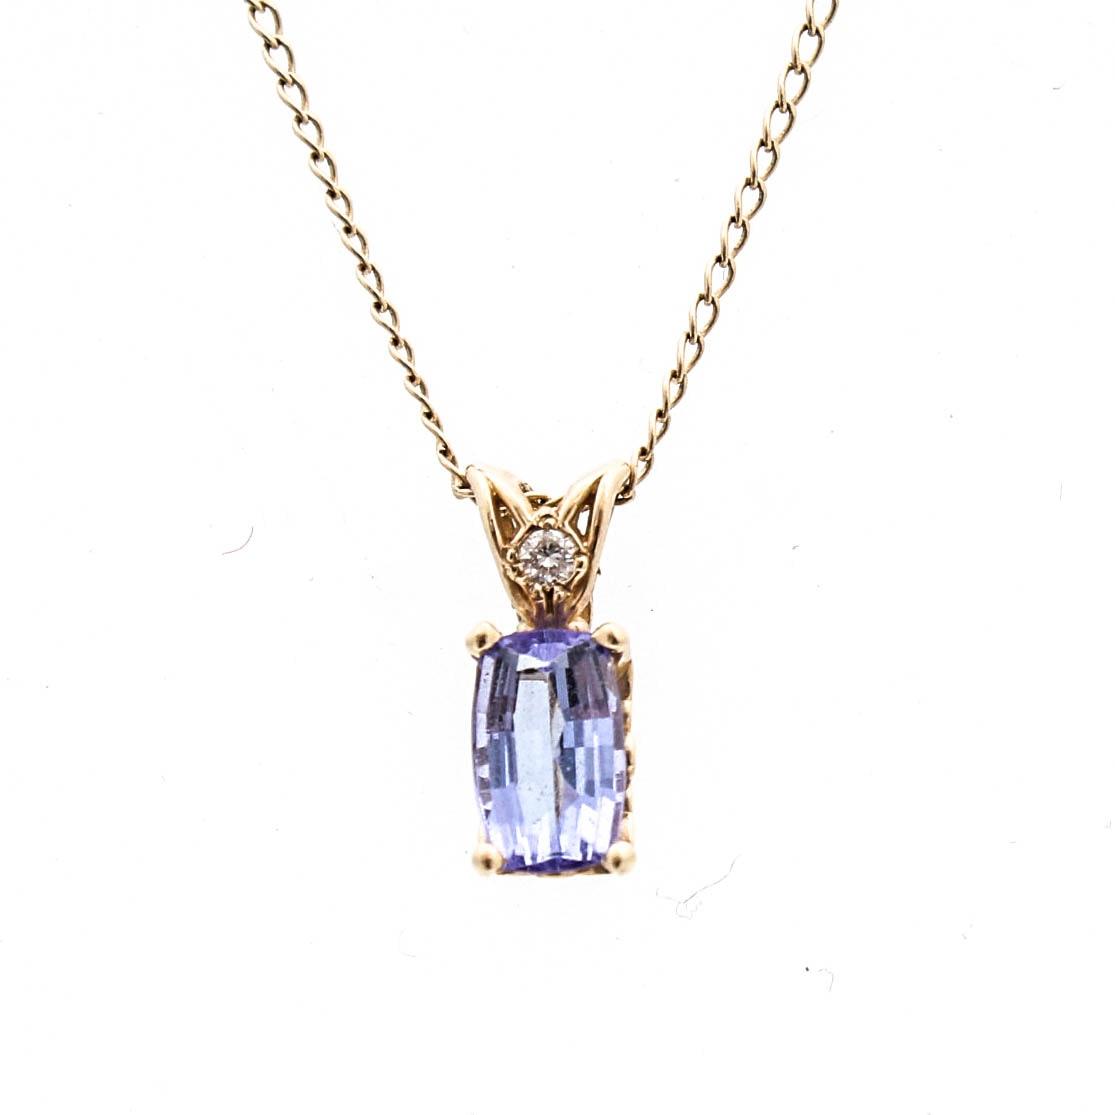 14K Yellow Gold Tanzanite and Diamond Pendant Necklace